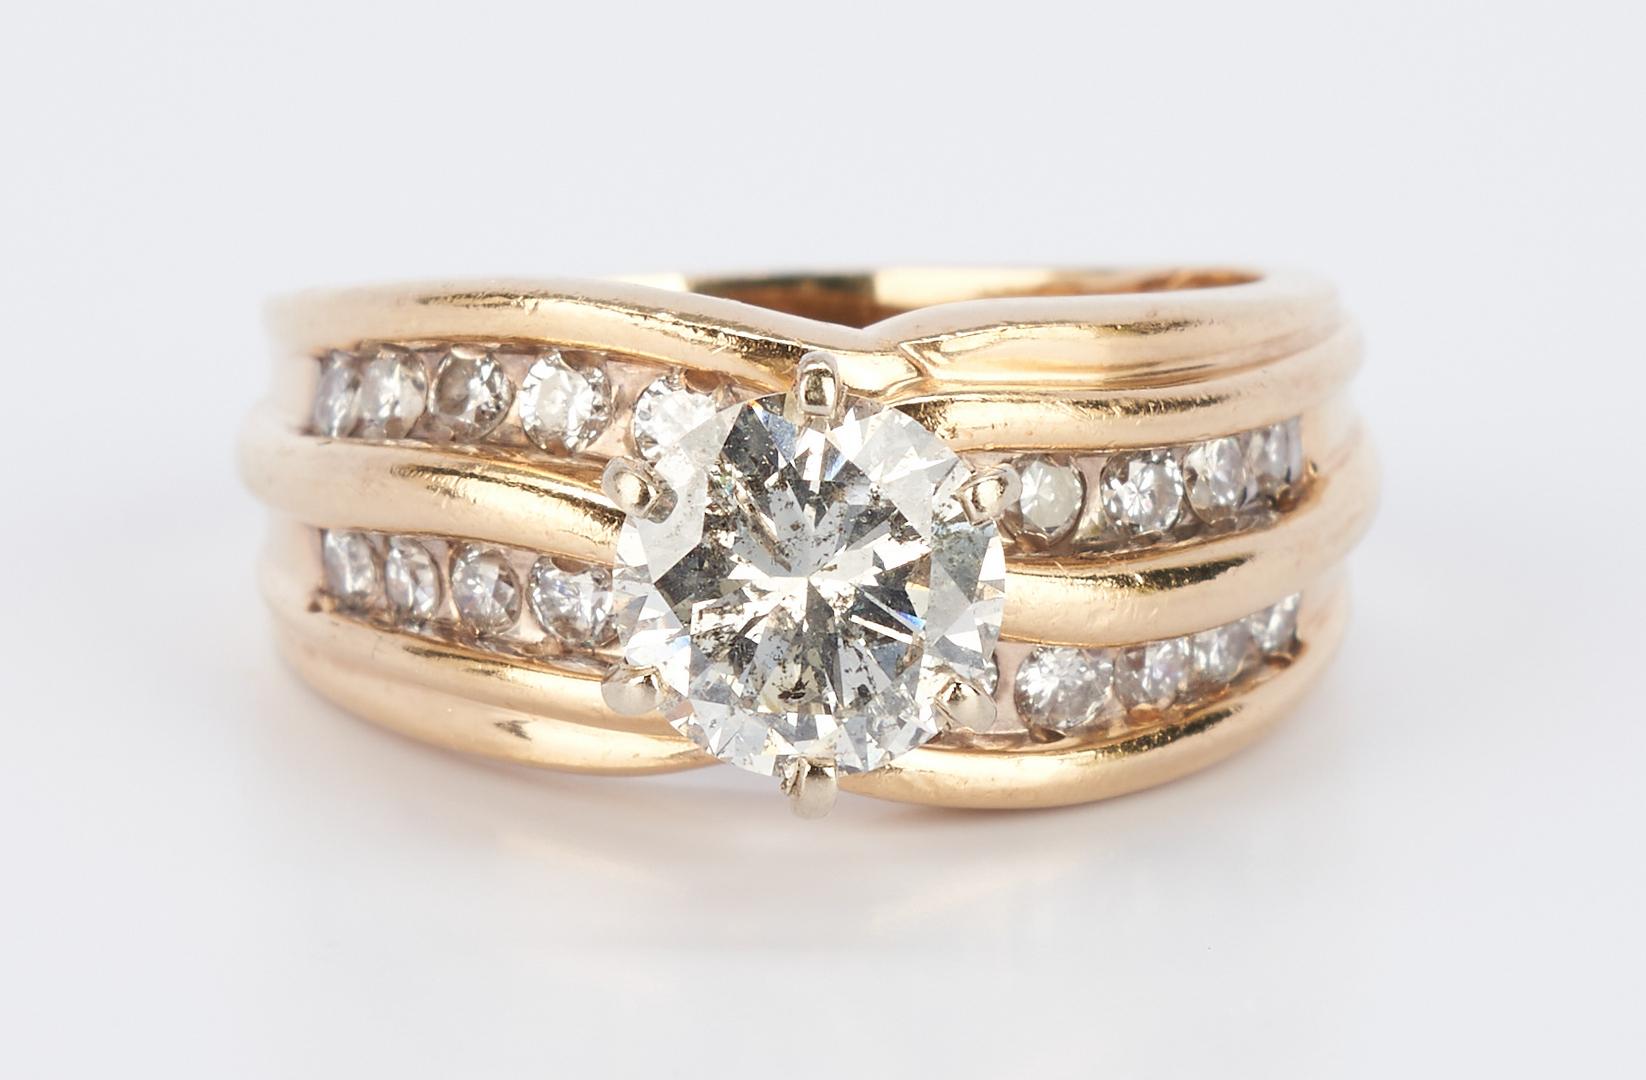 Lot 221: Lady's Diamond & 14K Engagement Ring